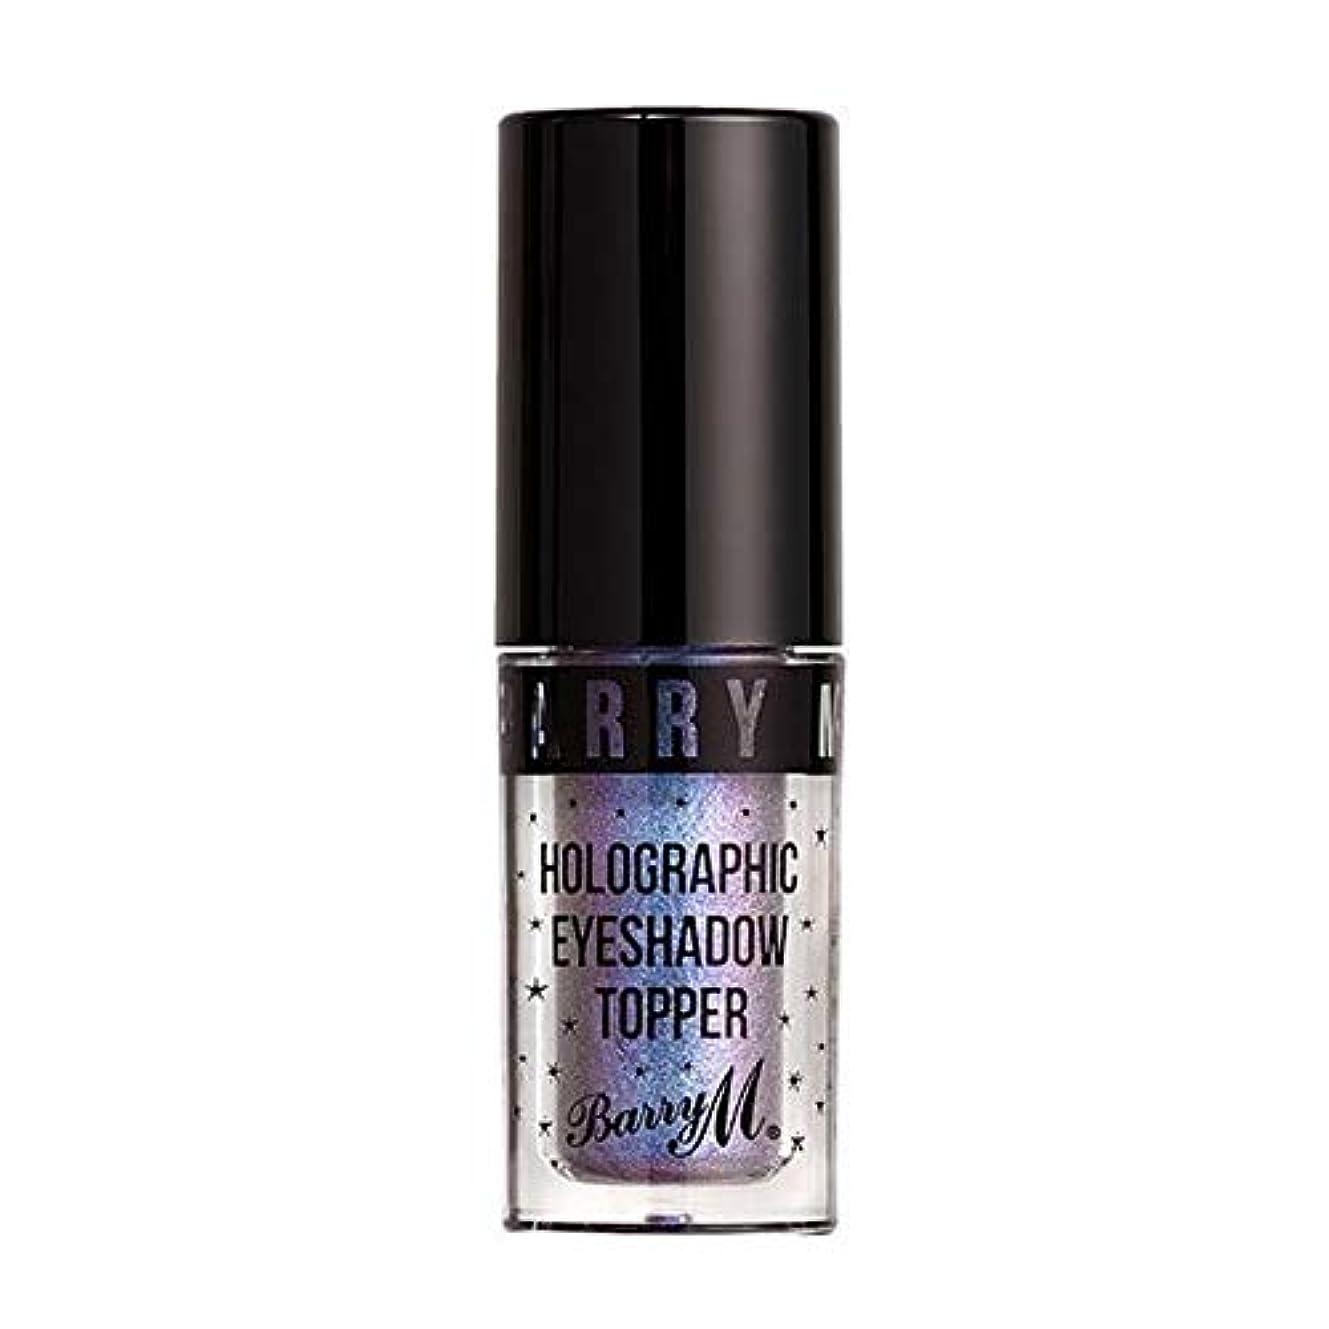 [Barry M ] バリーMホログラフィックアイトッパー - ルナ - Barry M Holographic Eye Topper - Luna [並行輸入品]